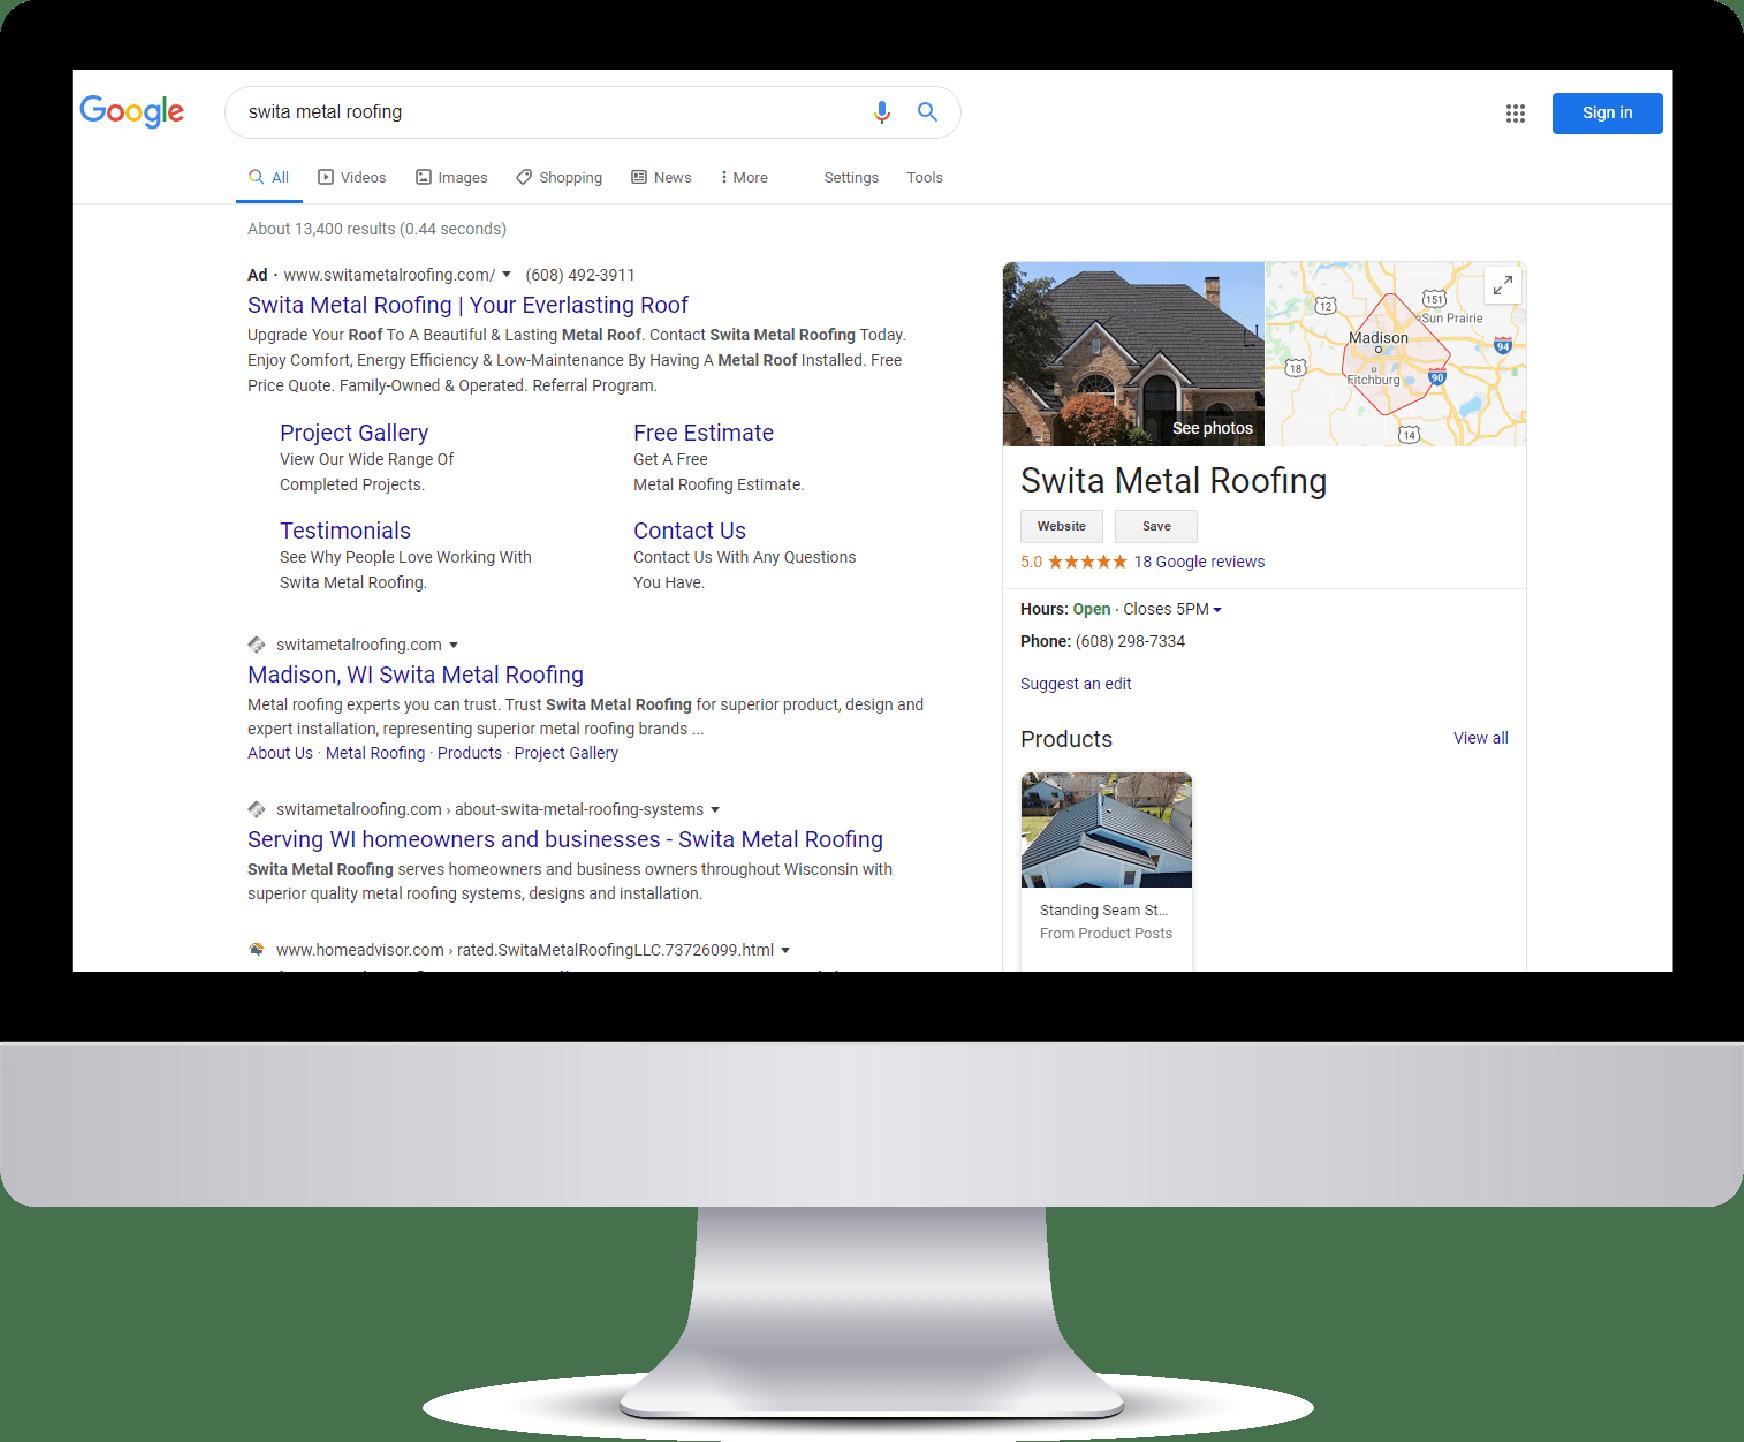 Swita Metal Roofing Google search results on desktop